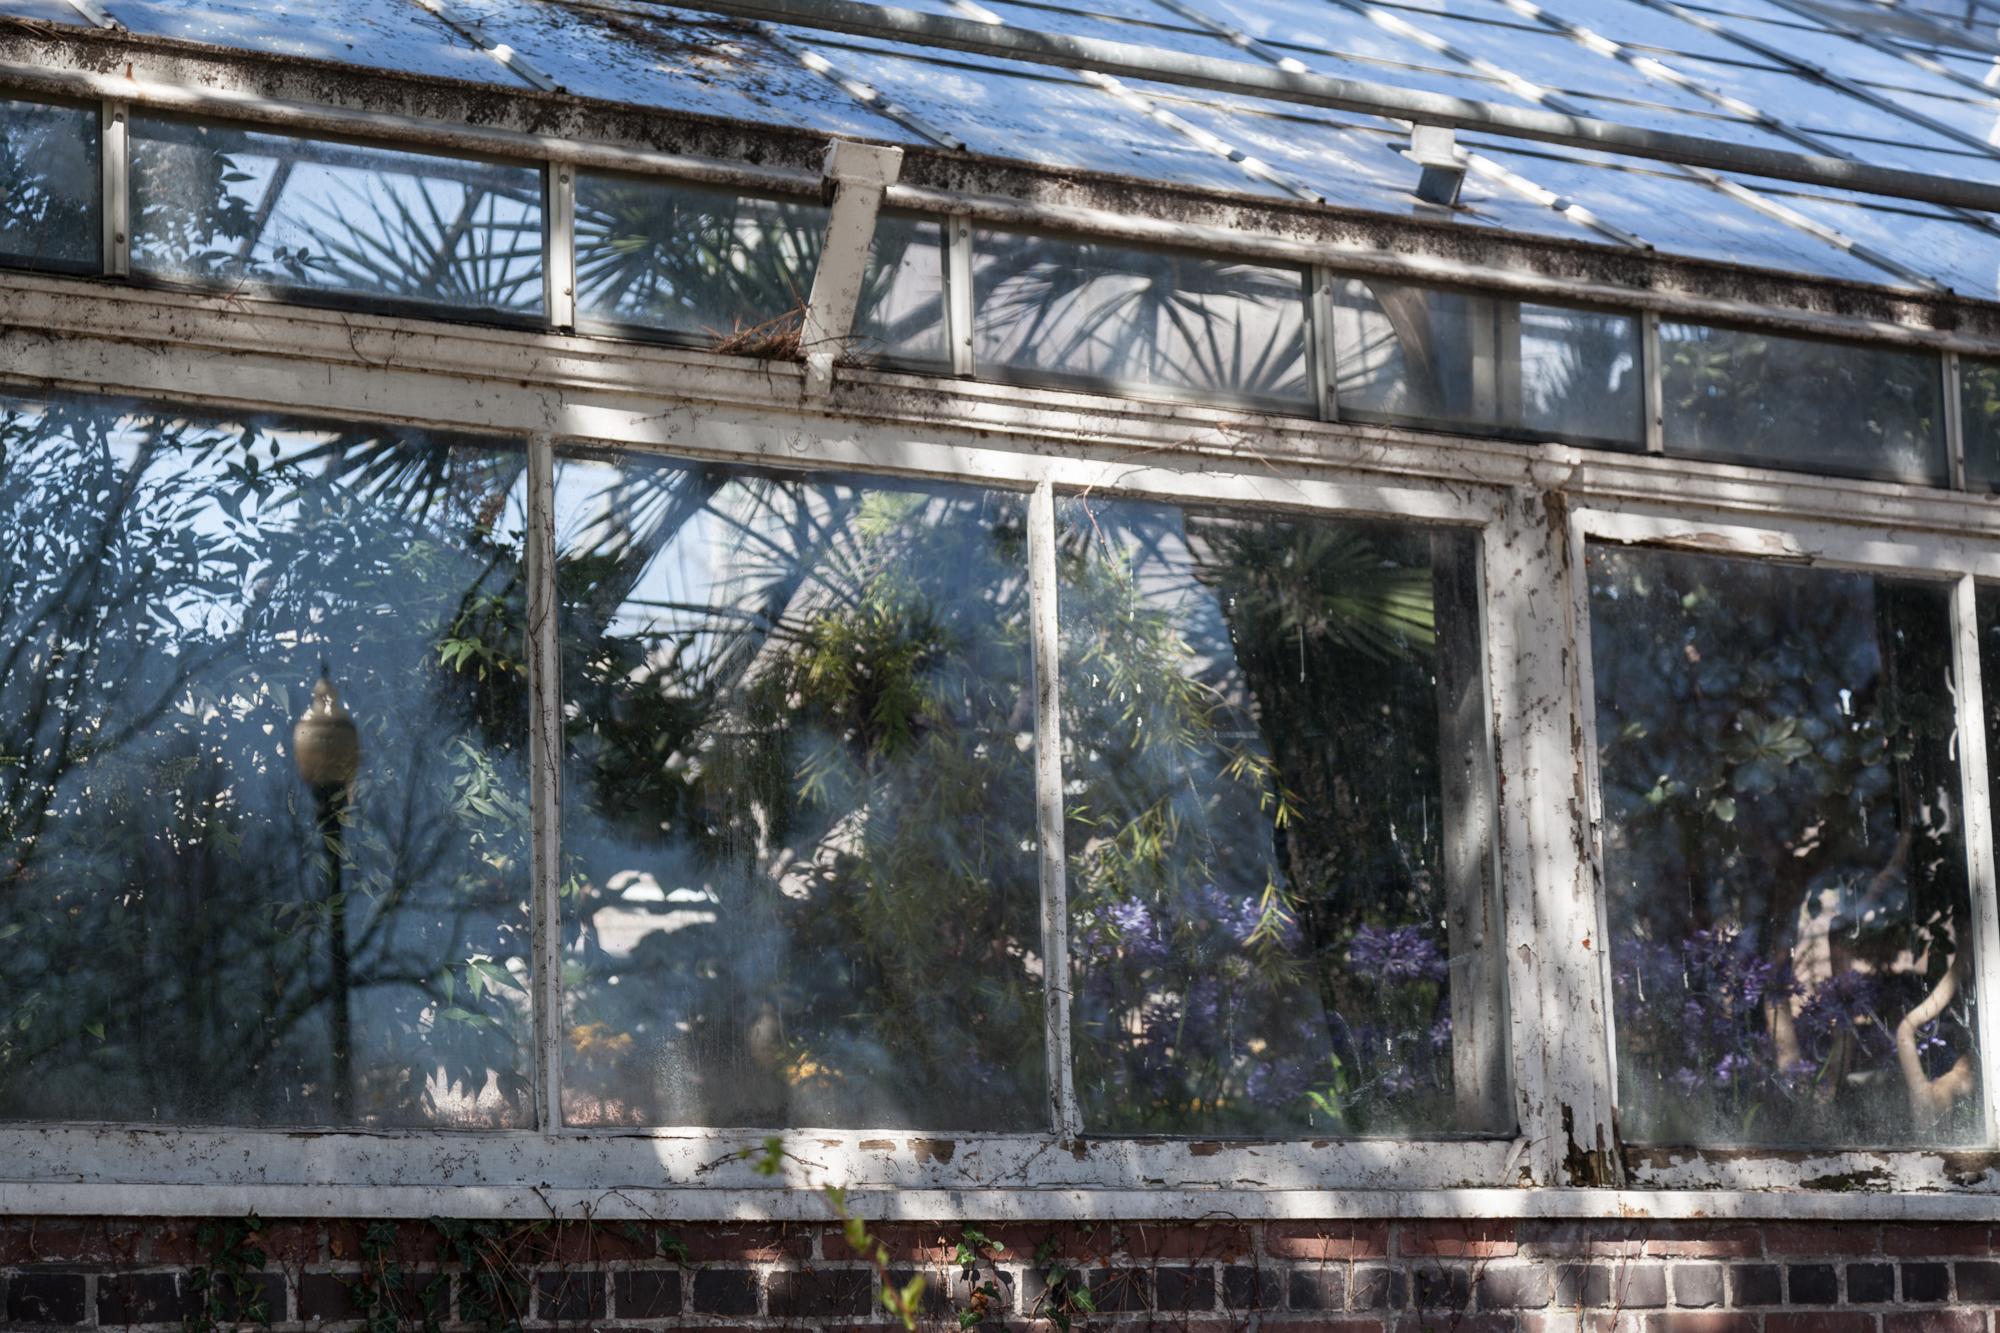 Allan-Garden-Conservatory-Homestead-Brooklyn.jpg